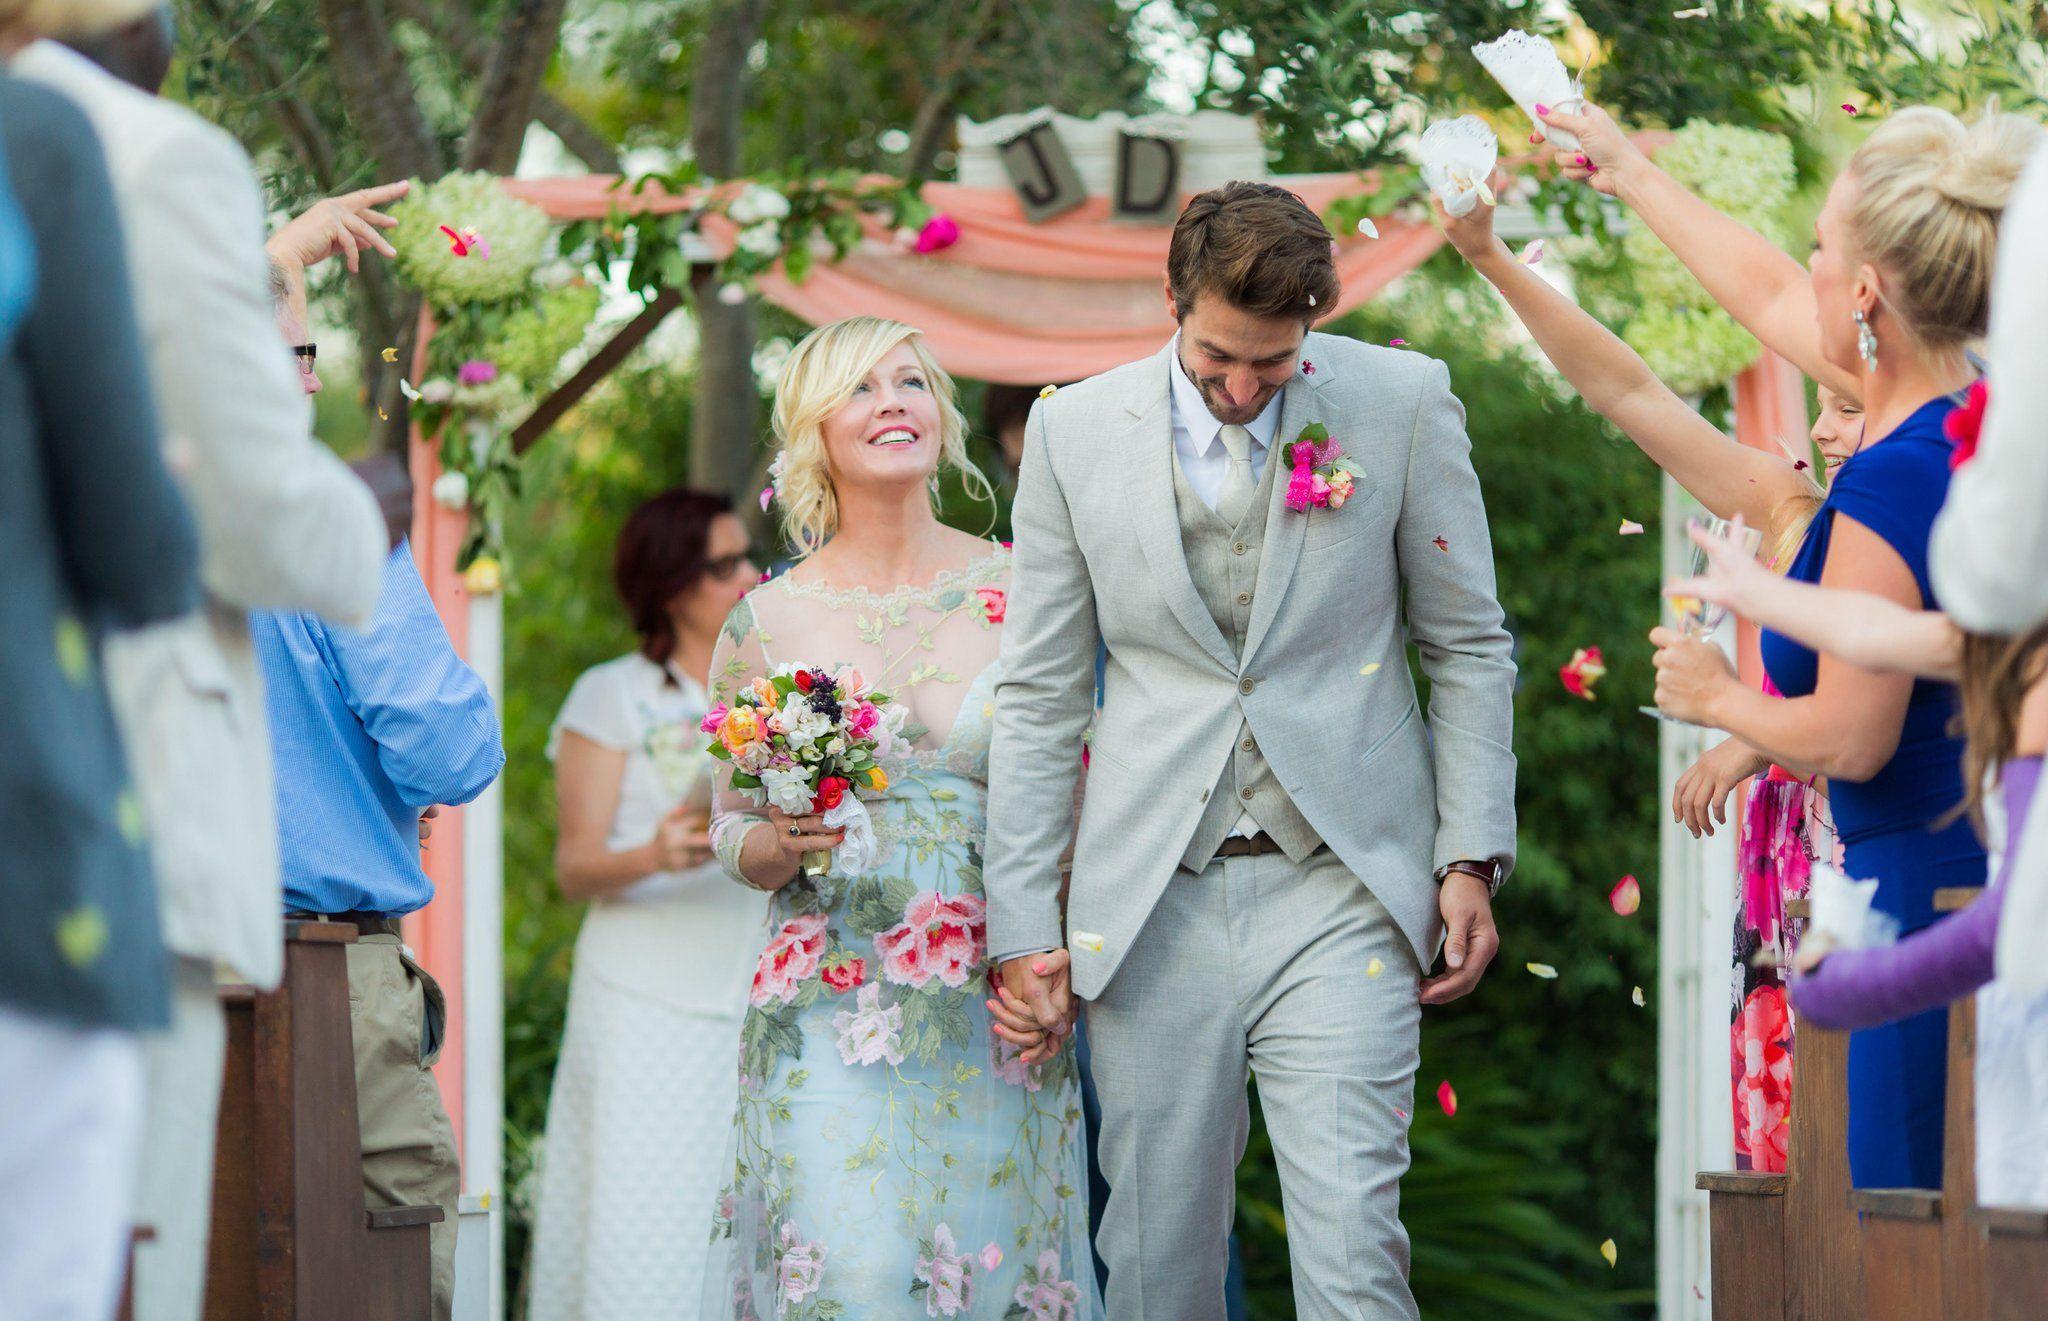 peter facinelli & jennie garth - his 1st, her 2nd | Married Movie ...